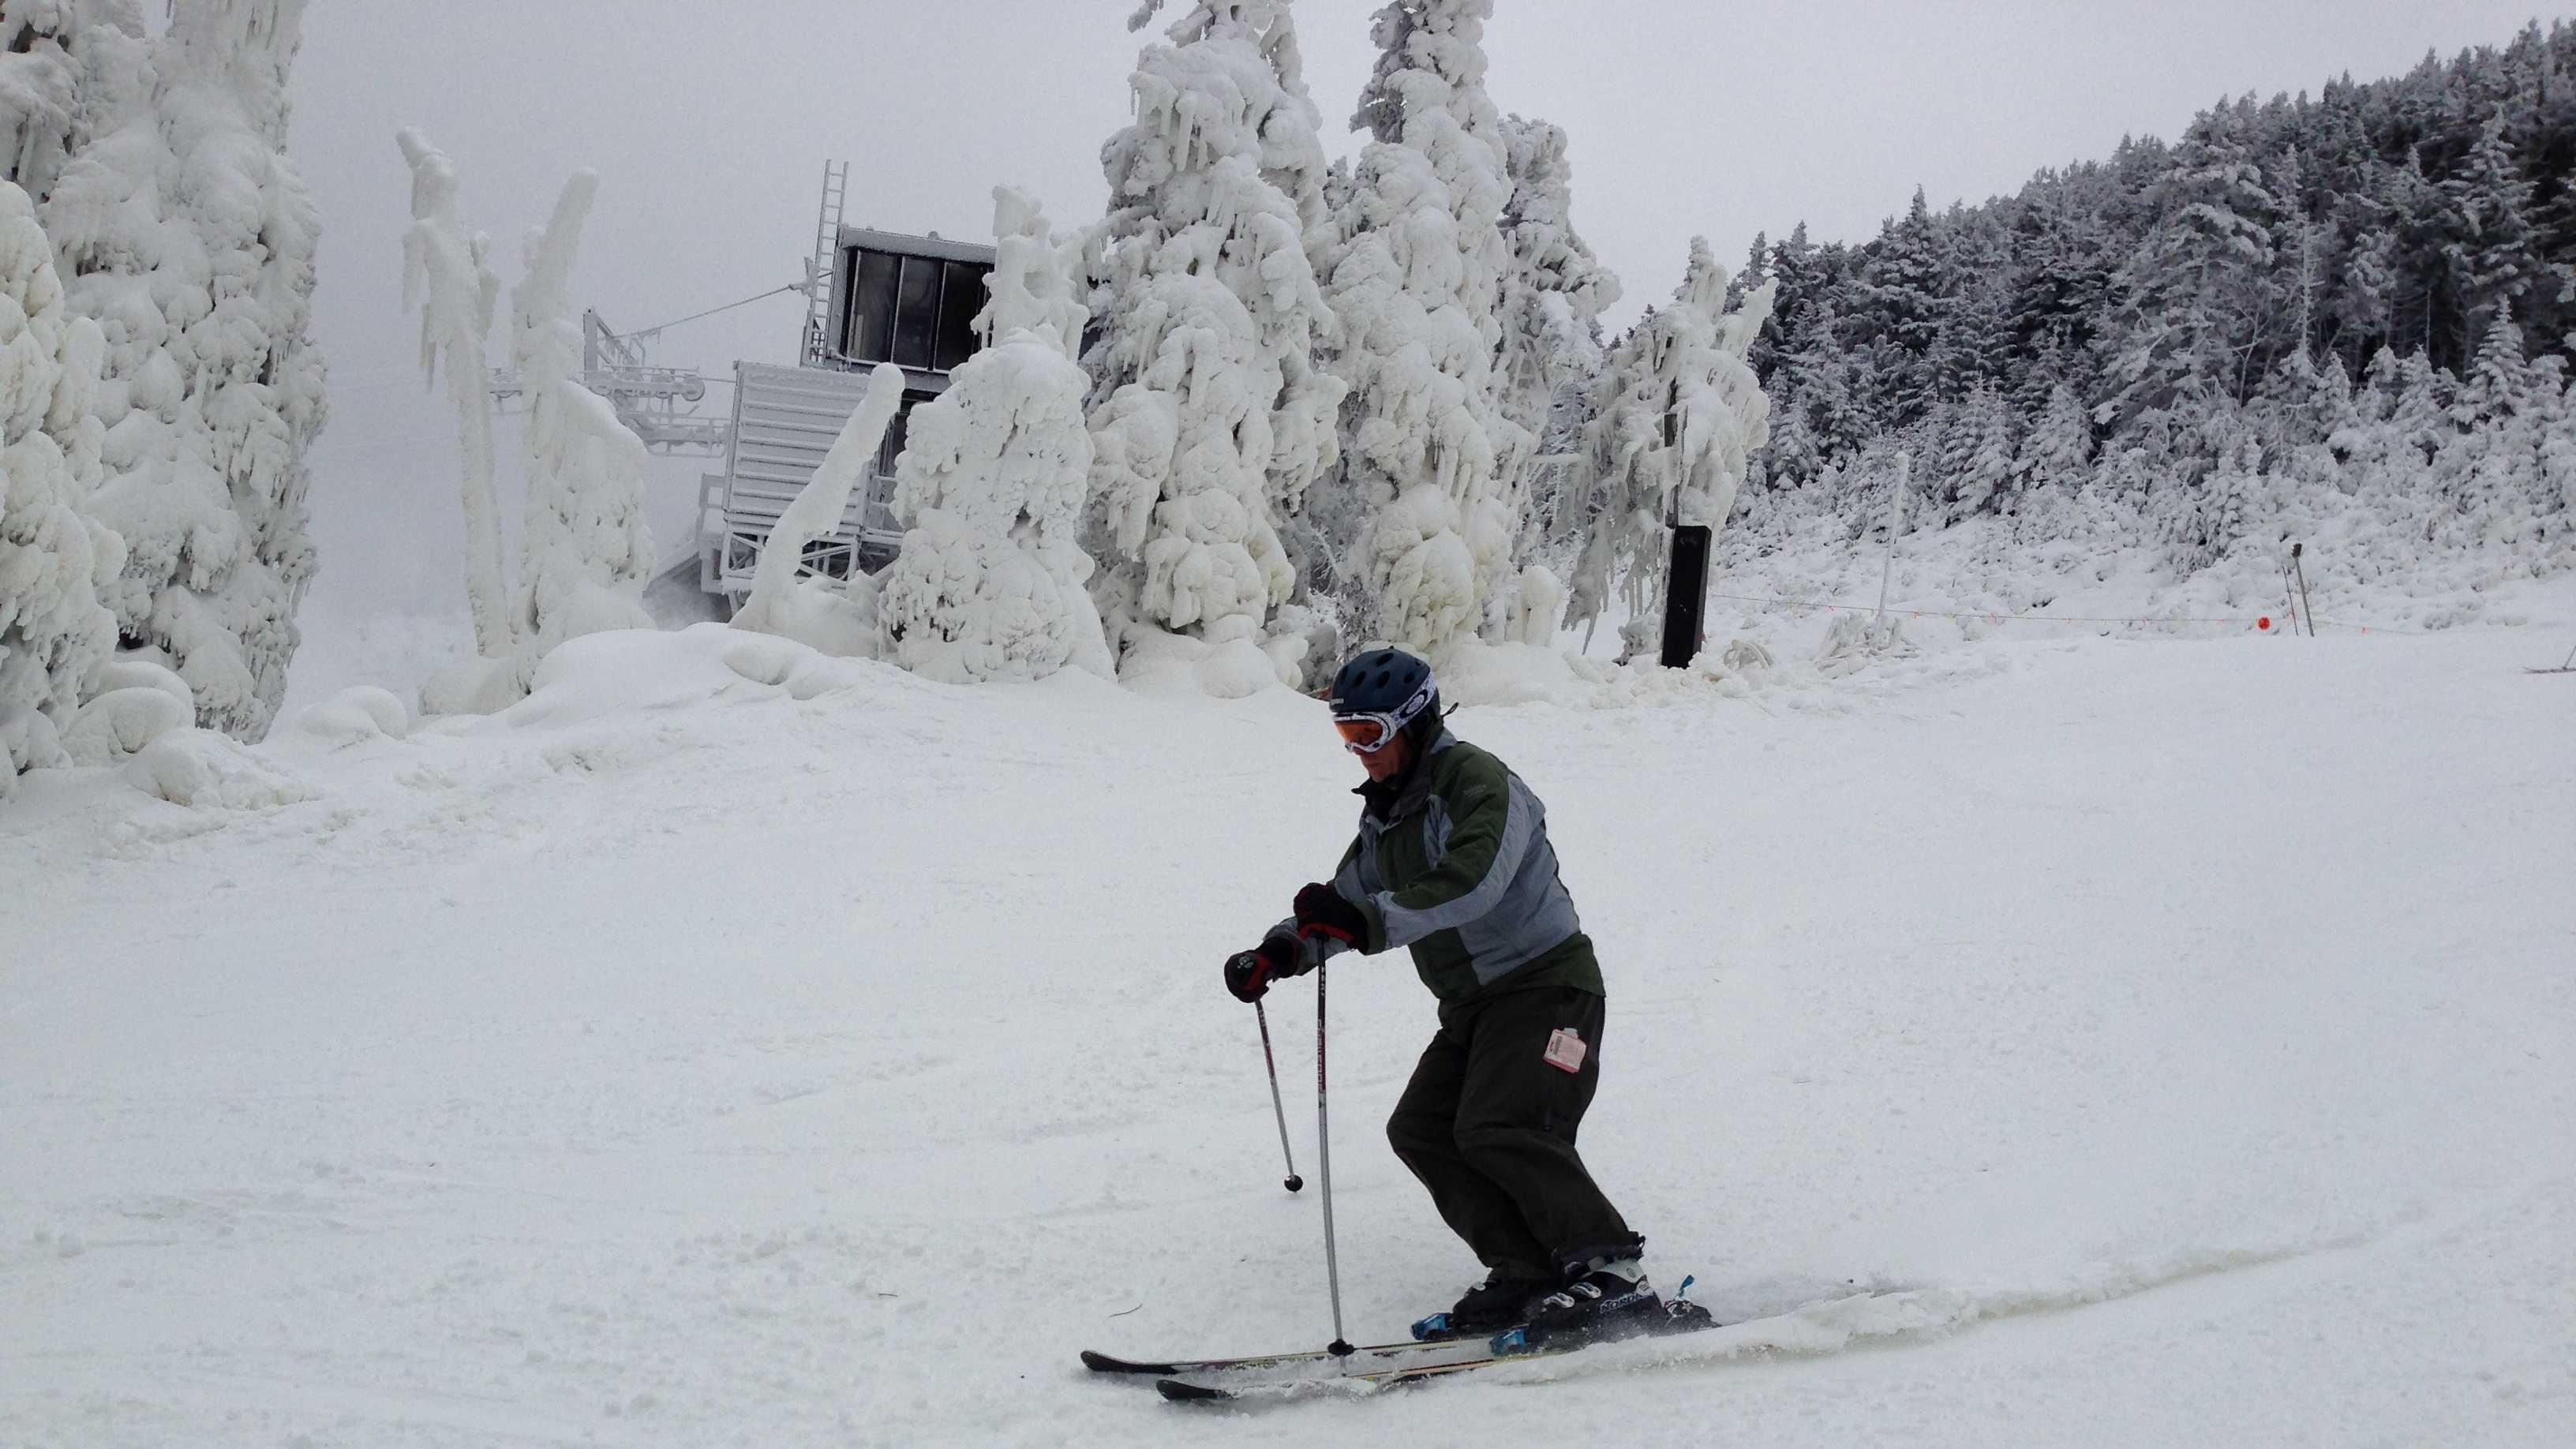 Snow covers Killington 3